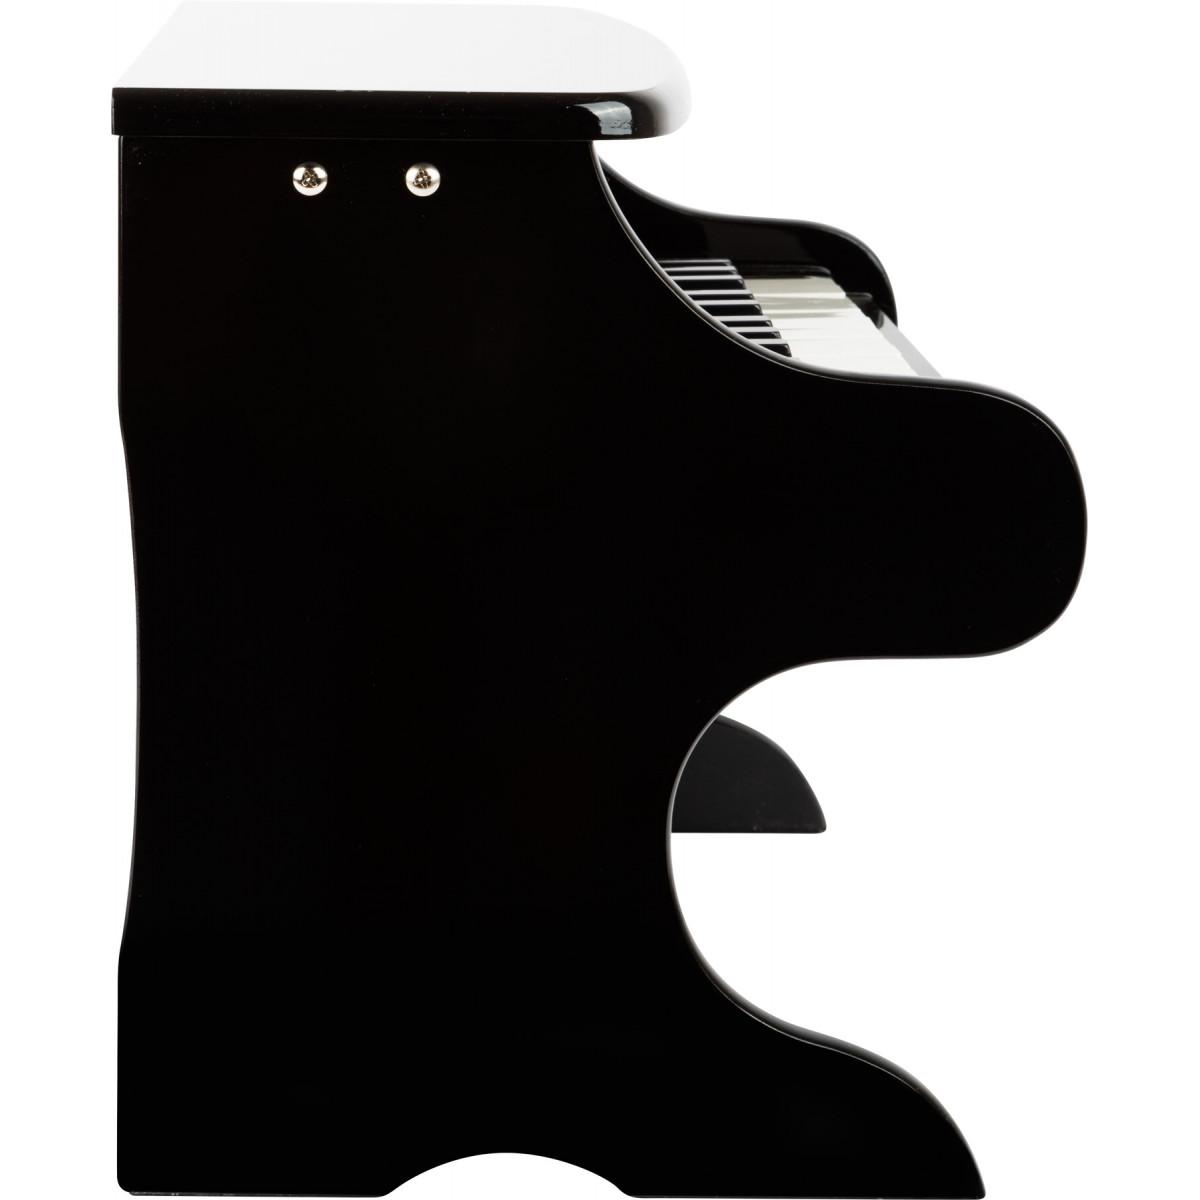 Piano Jouet Noir - 2 Octaves